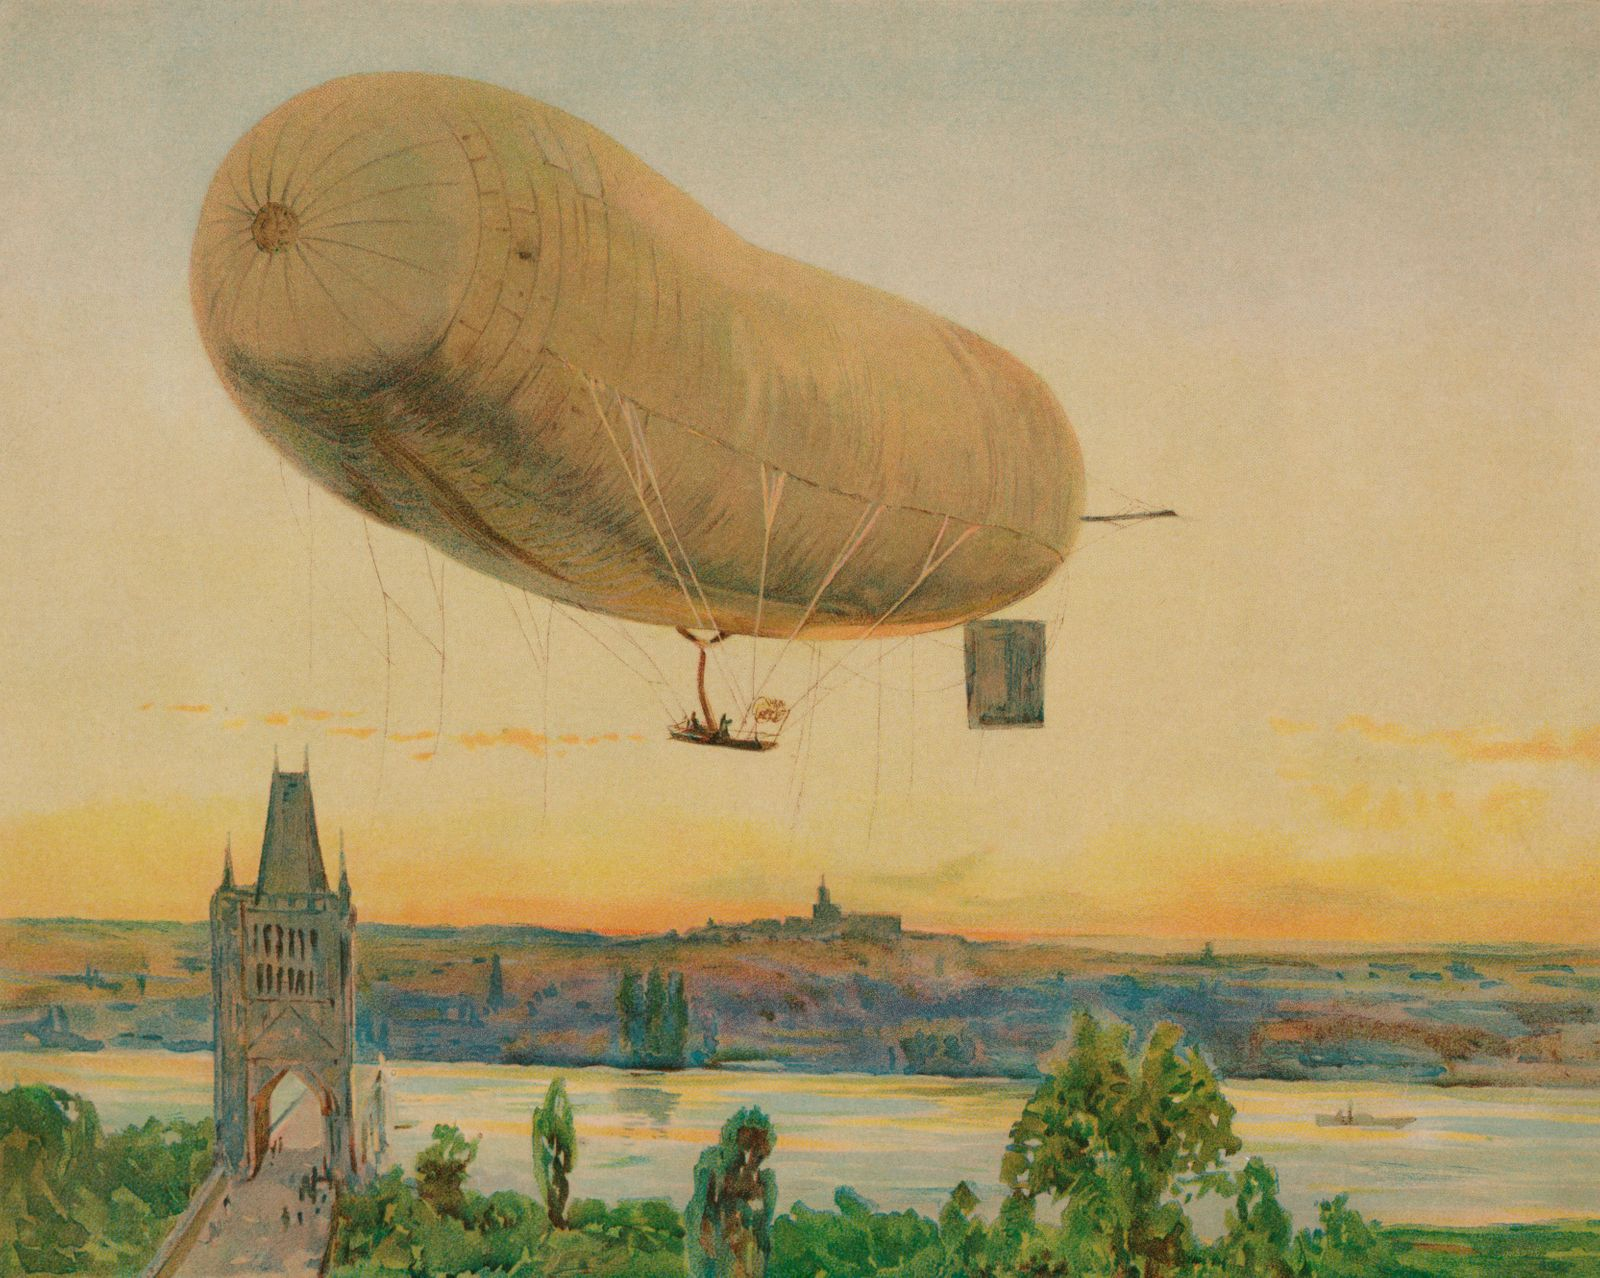 ?The Parseval III: German Military Airship?, 1909.